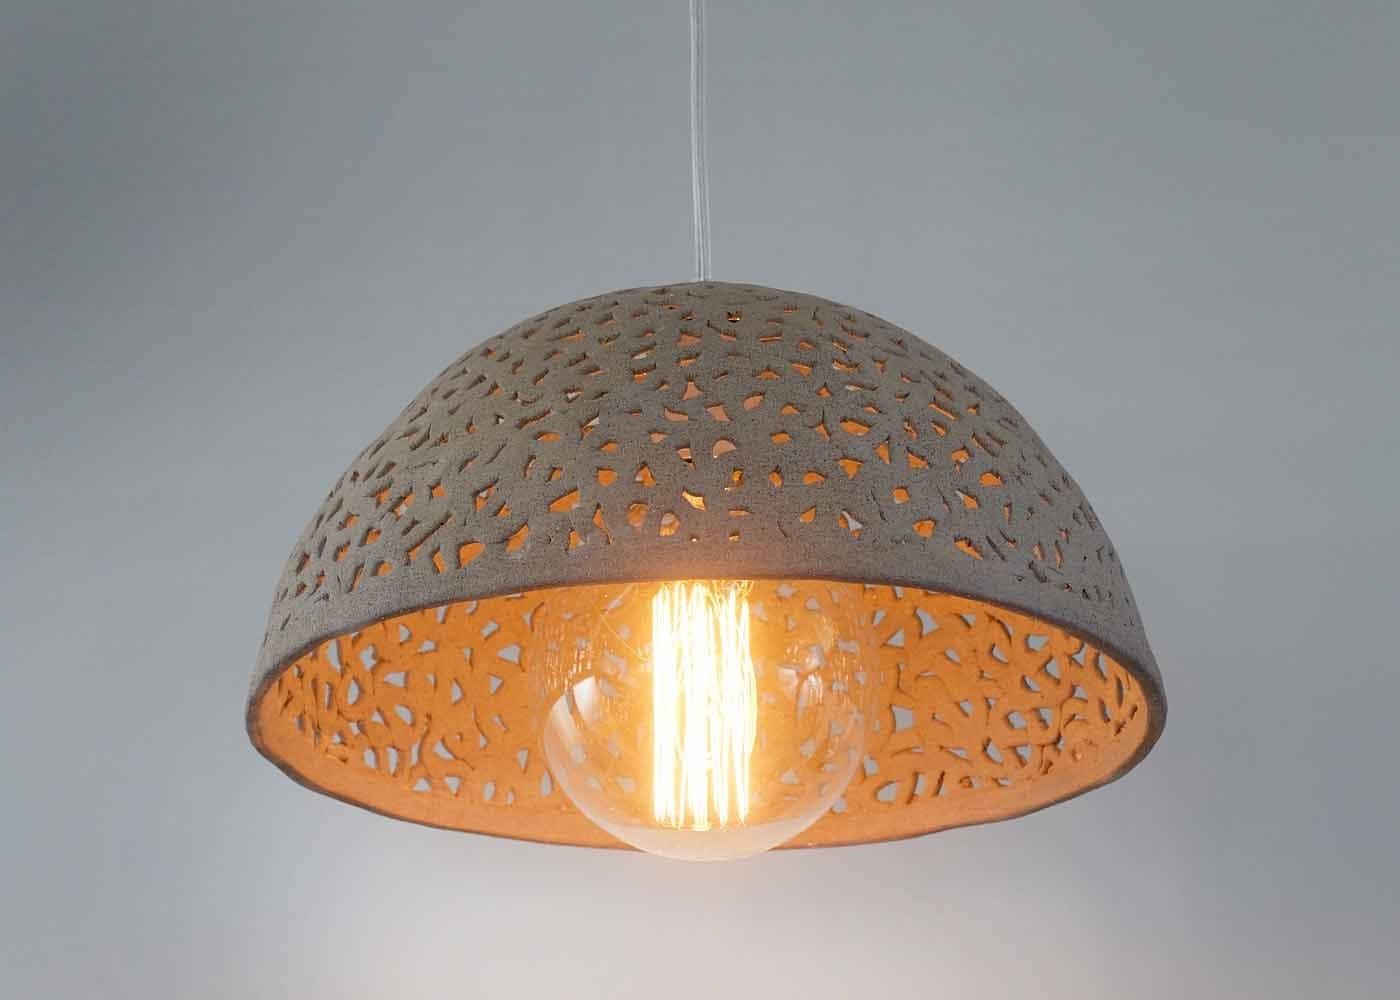 Ceramic Wall Lamp Shades : Ceramic lamp shade. Dome pendant light. Pendant lighting